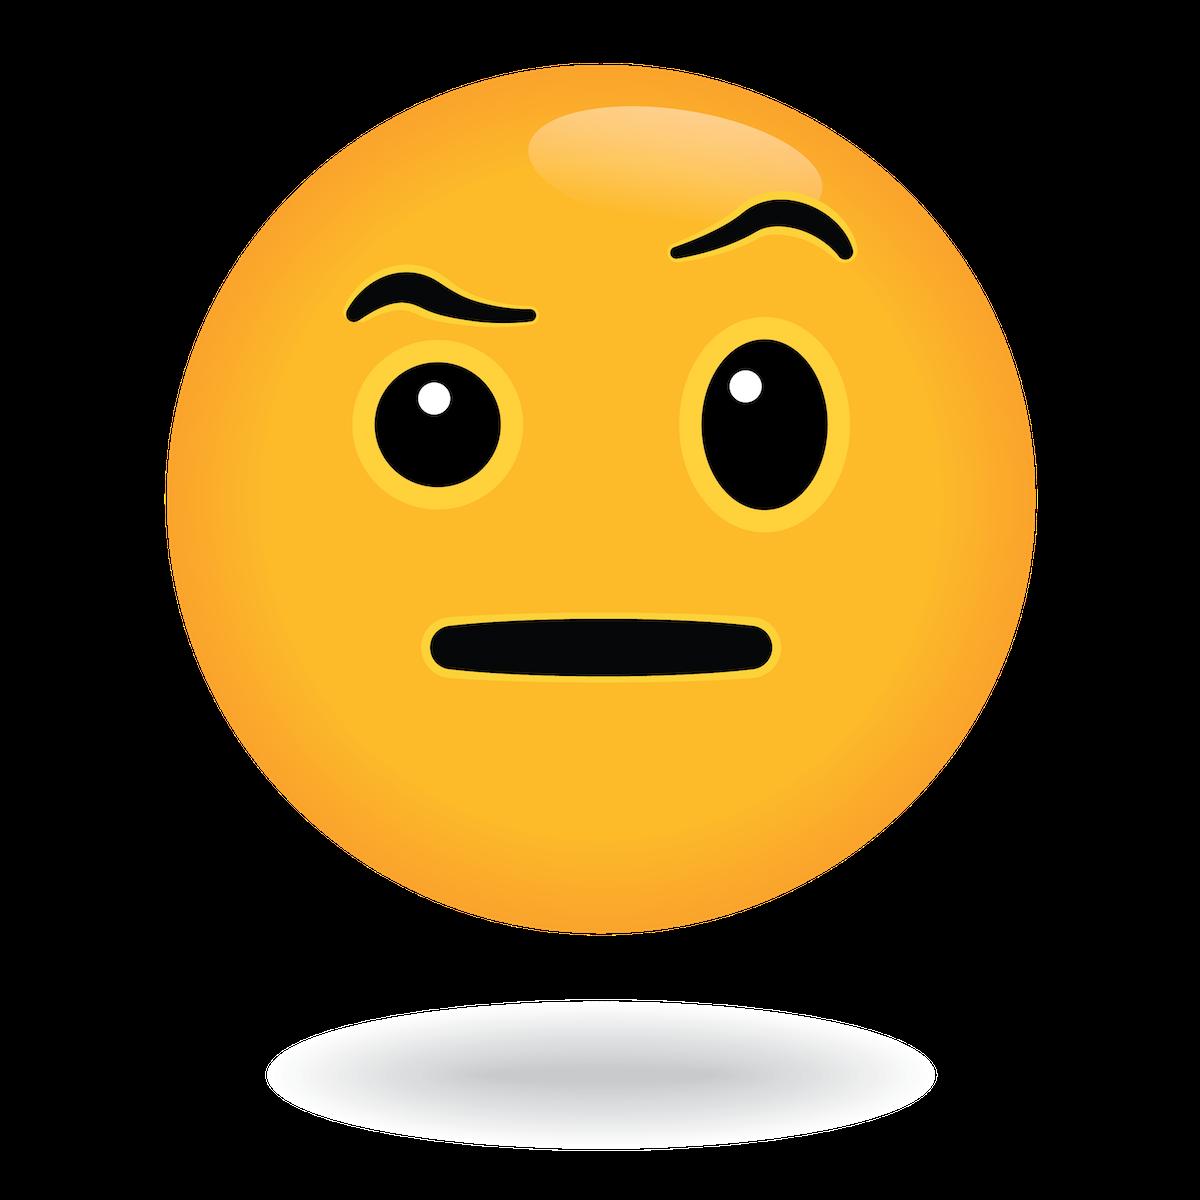 eyebrow emoji by define awesome